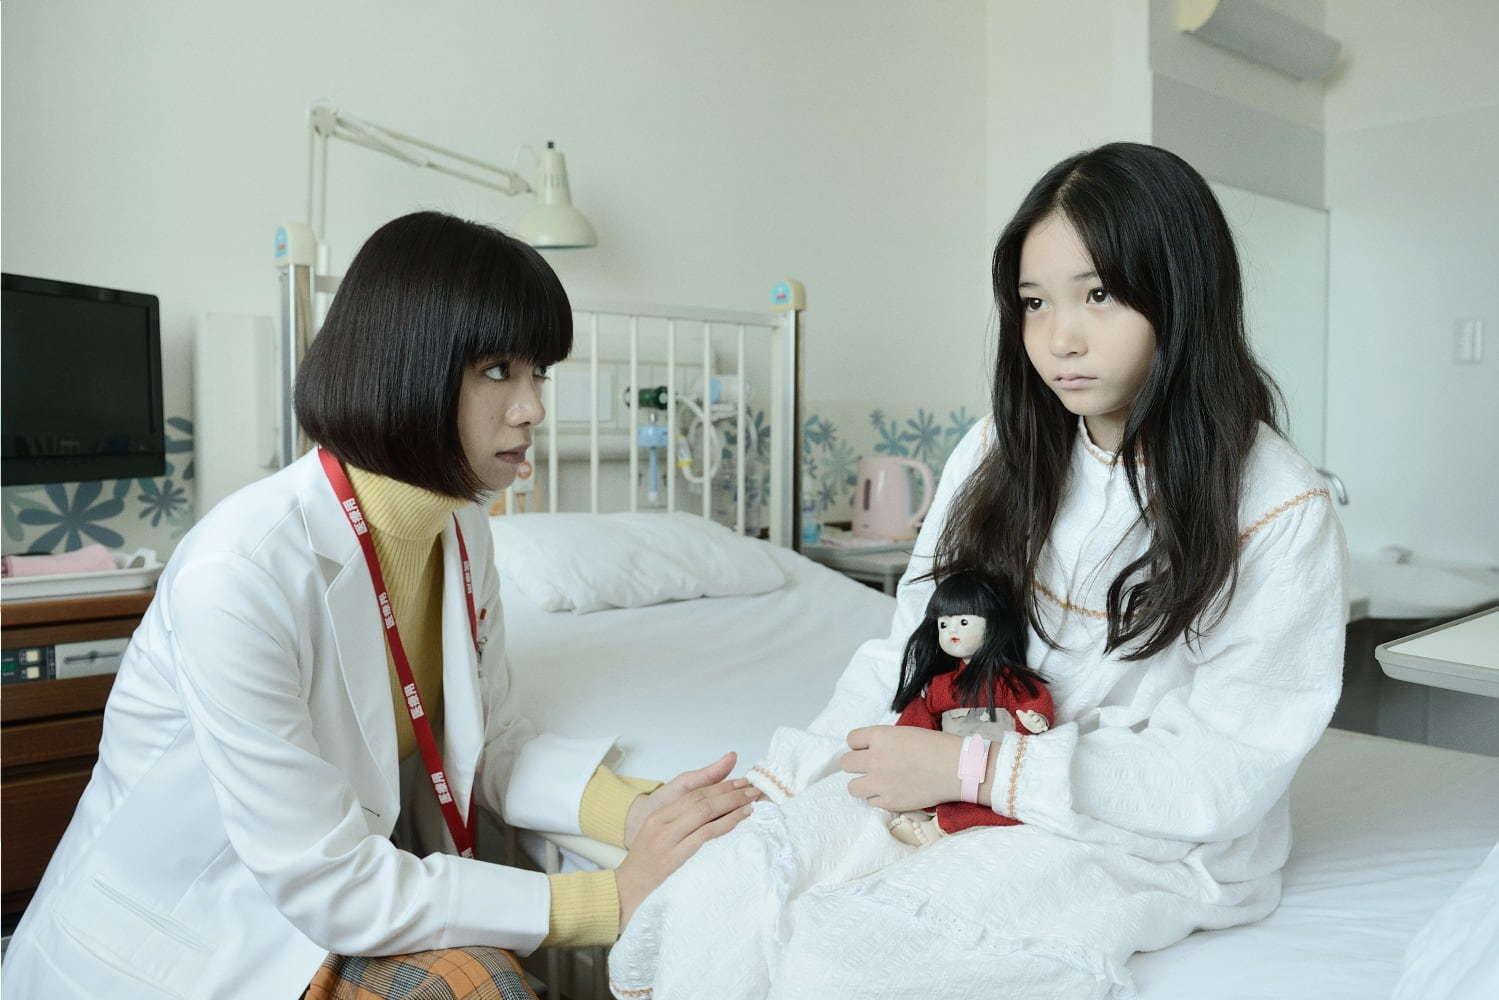 「貞子 映画」の画像検索結果